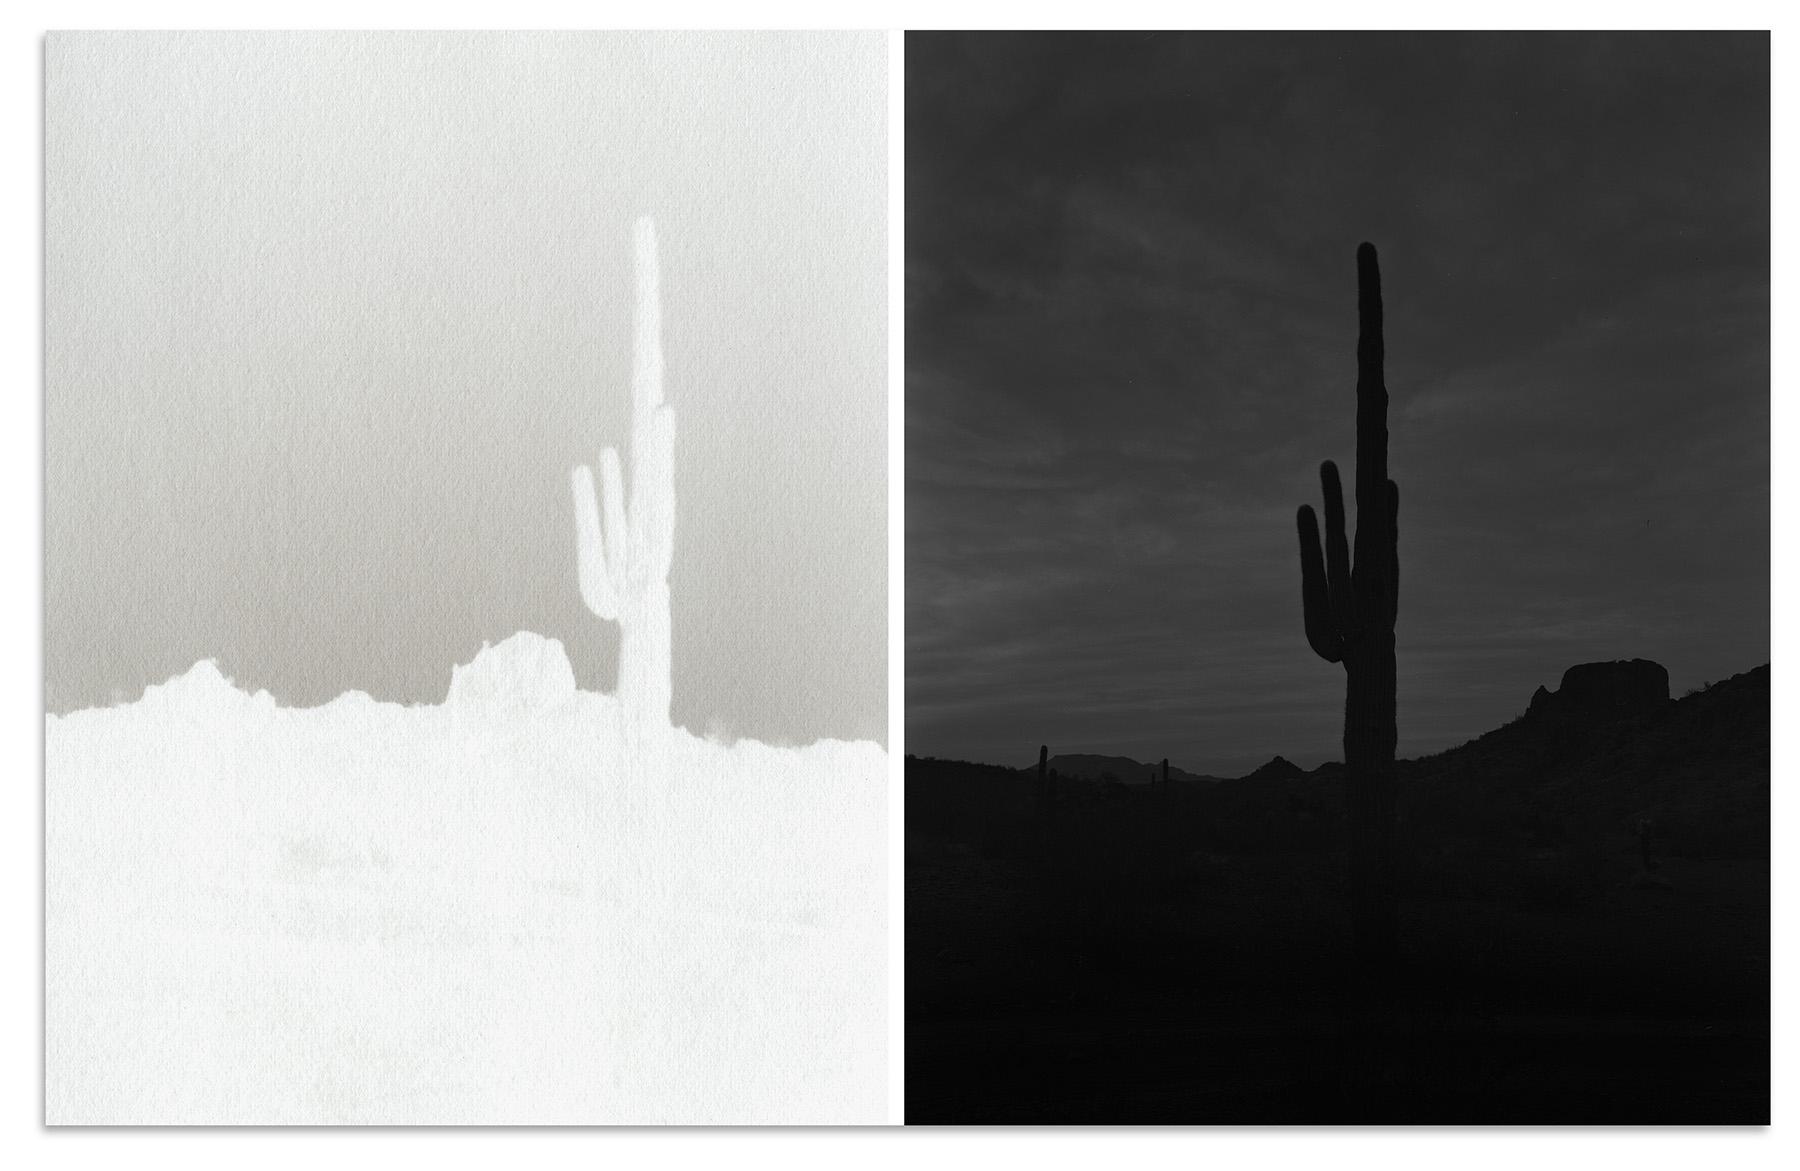 saugaro among volcanic landscape, new water mountains, arizona, 2018